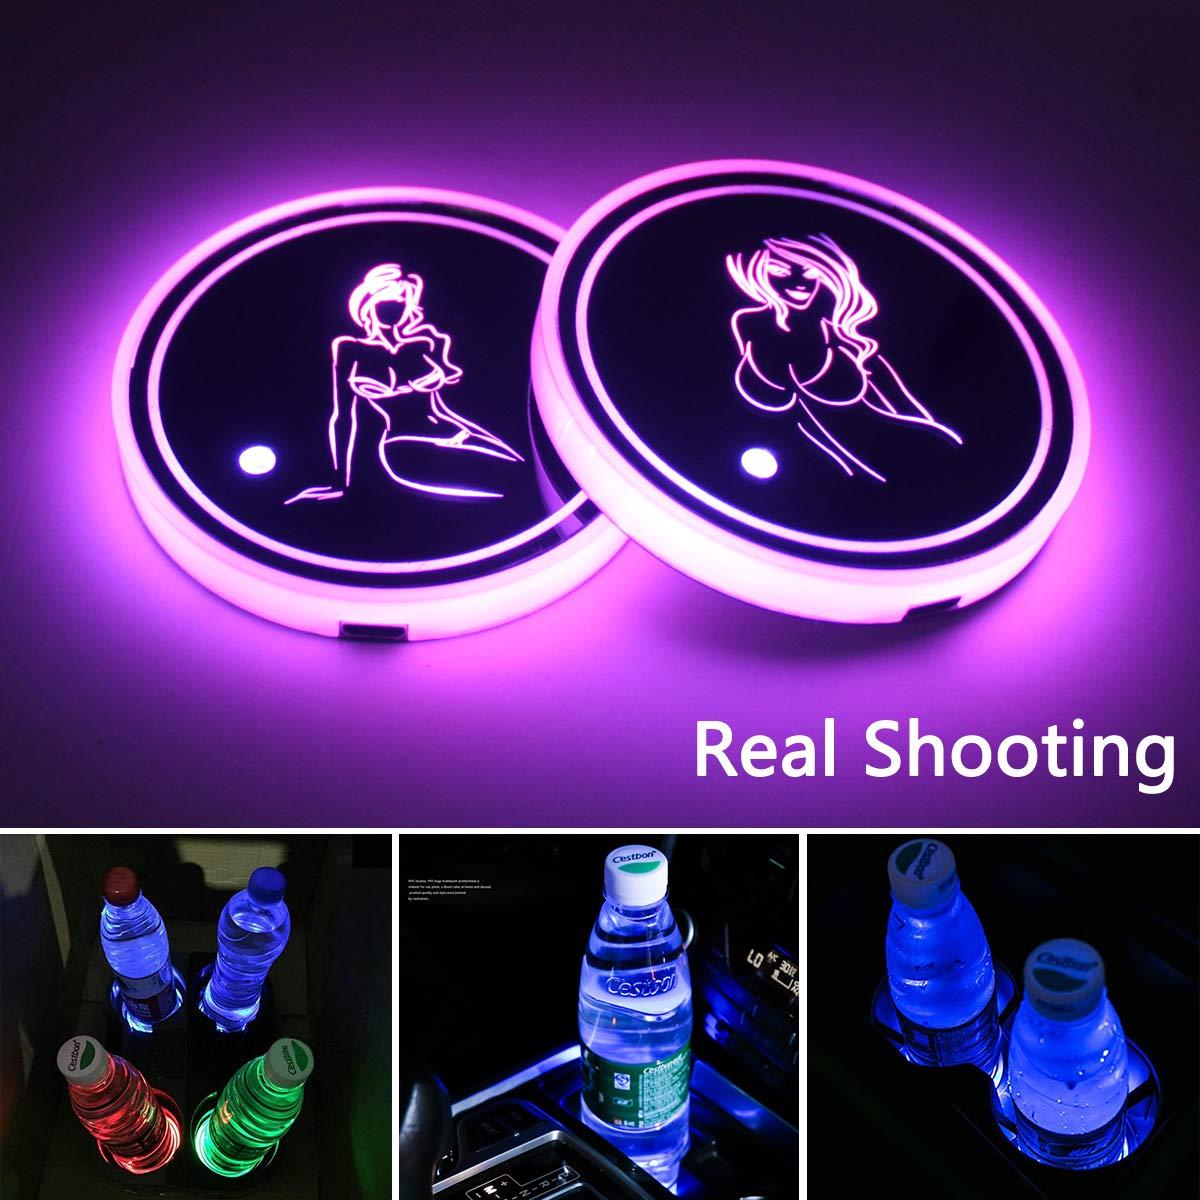 Alfombrilla de Carga USB 7 Colores cambiantes Almohadilla luminiscente Car-tools 2 Luces LED para portavasos de Coche l/ámpara LED de Ambiente Interior